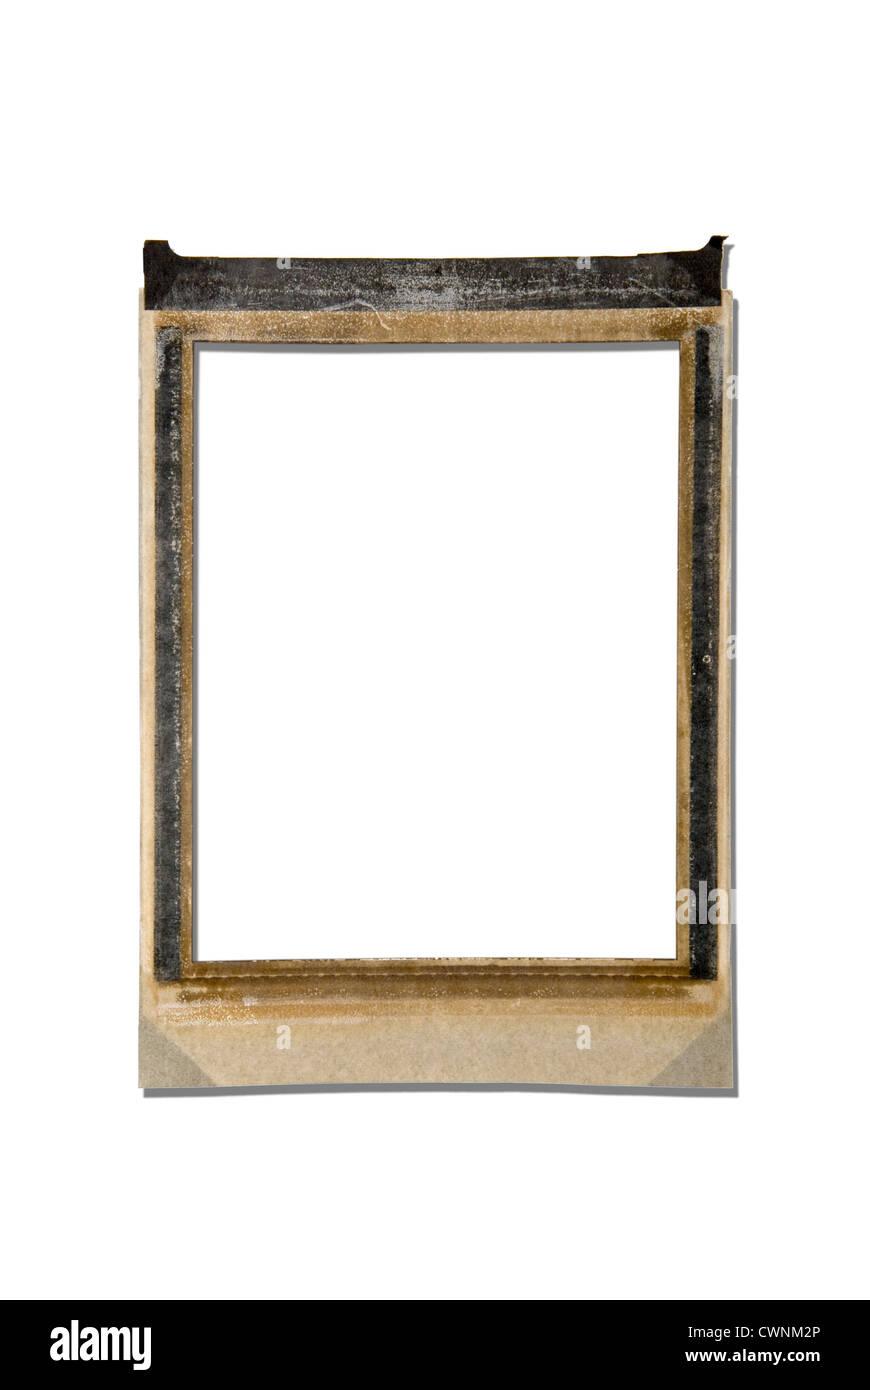 Empty polaroid frame, isolated on 100% white background Stock Photo